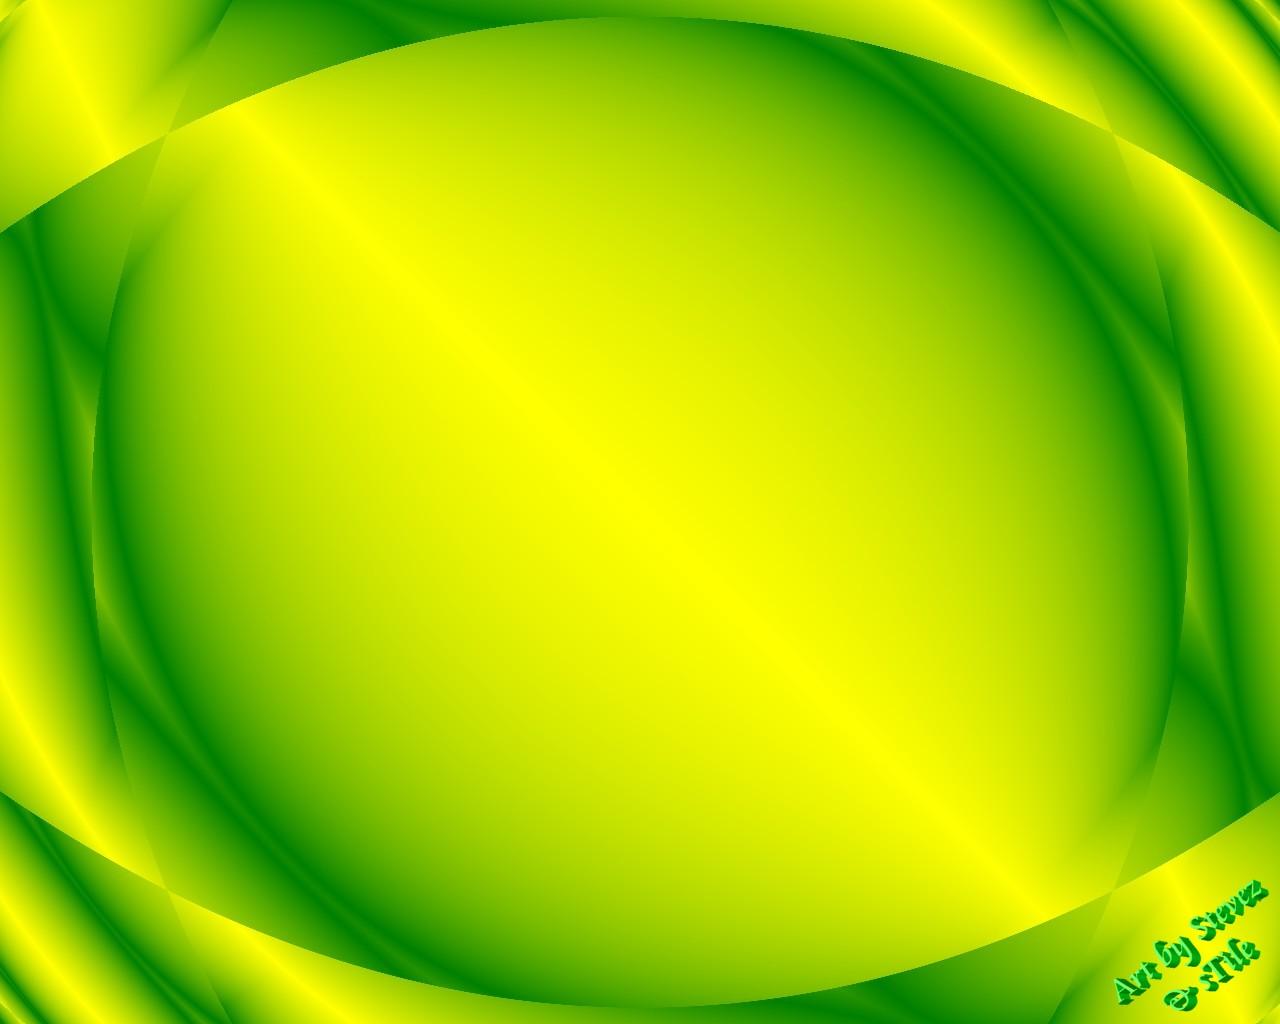 Yellow And Green Wallpapers: The Gaming Lemon Wallpaper